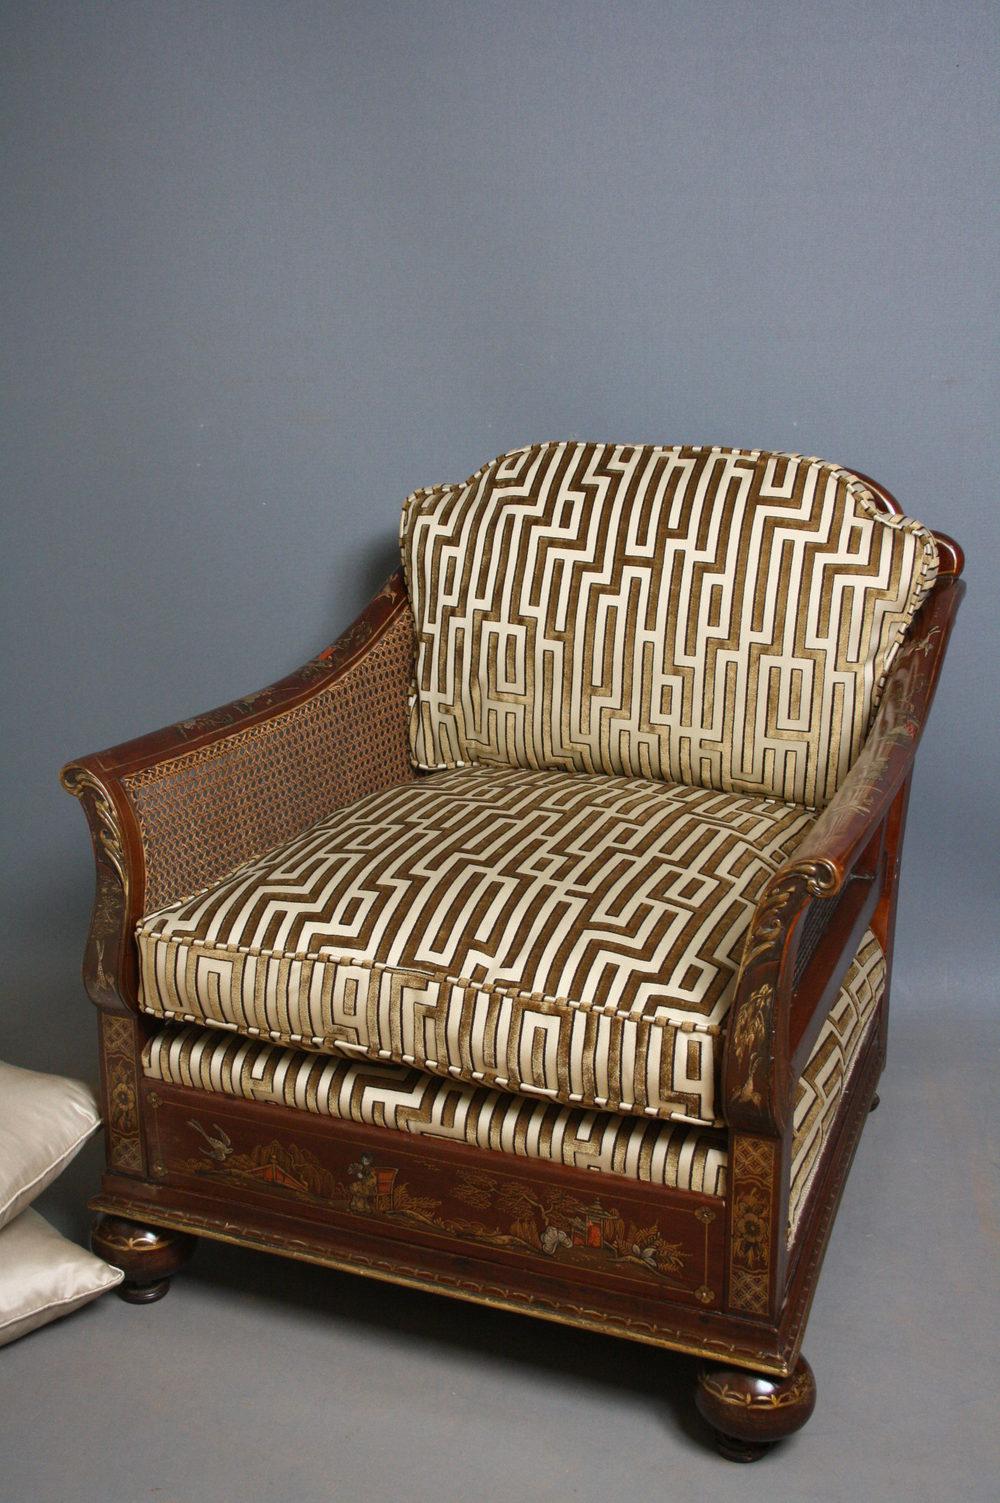 Bergere Armchair Antique Bergere Chairs ... - Bergere Armchair - Antiques Atlas